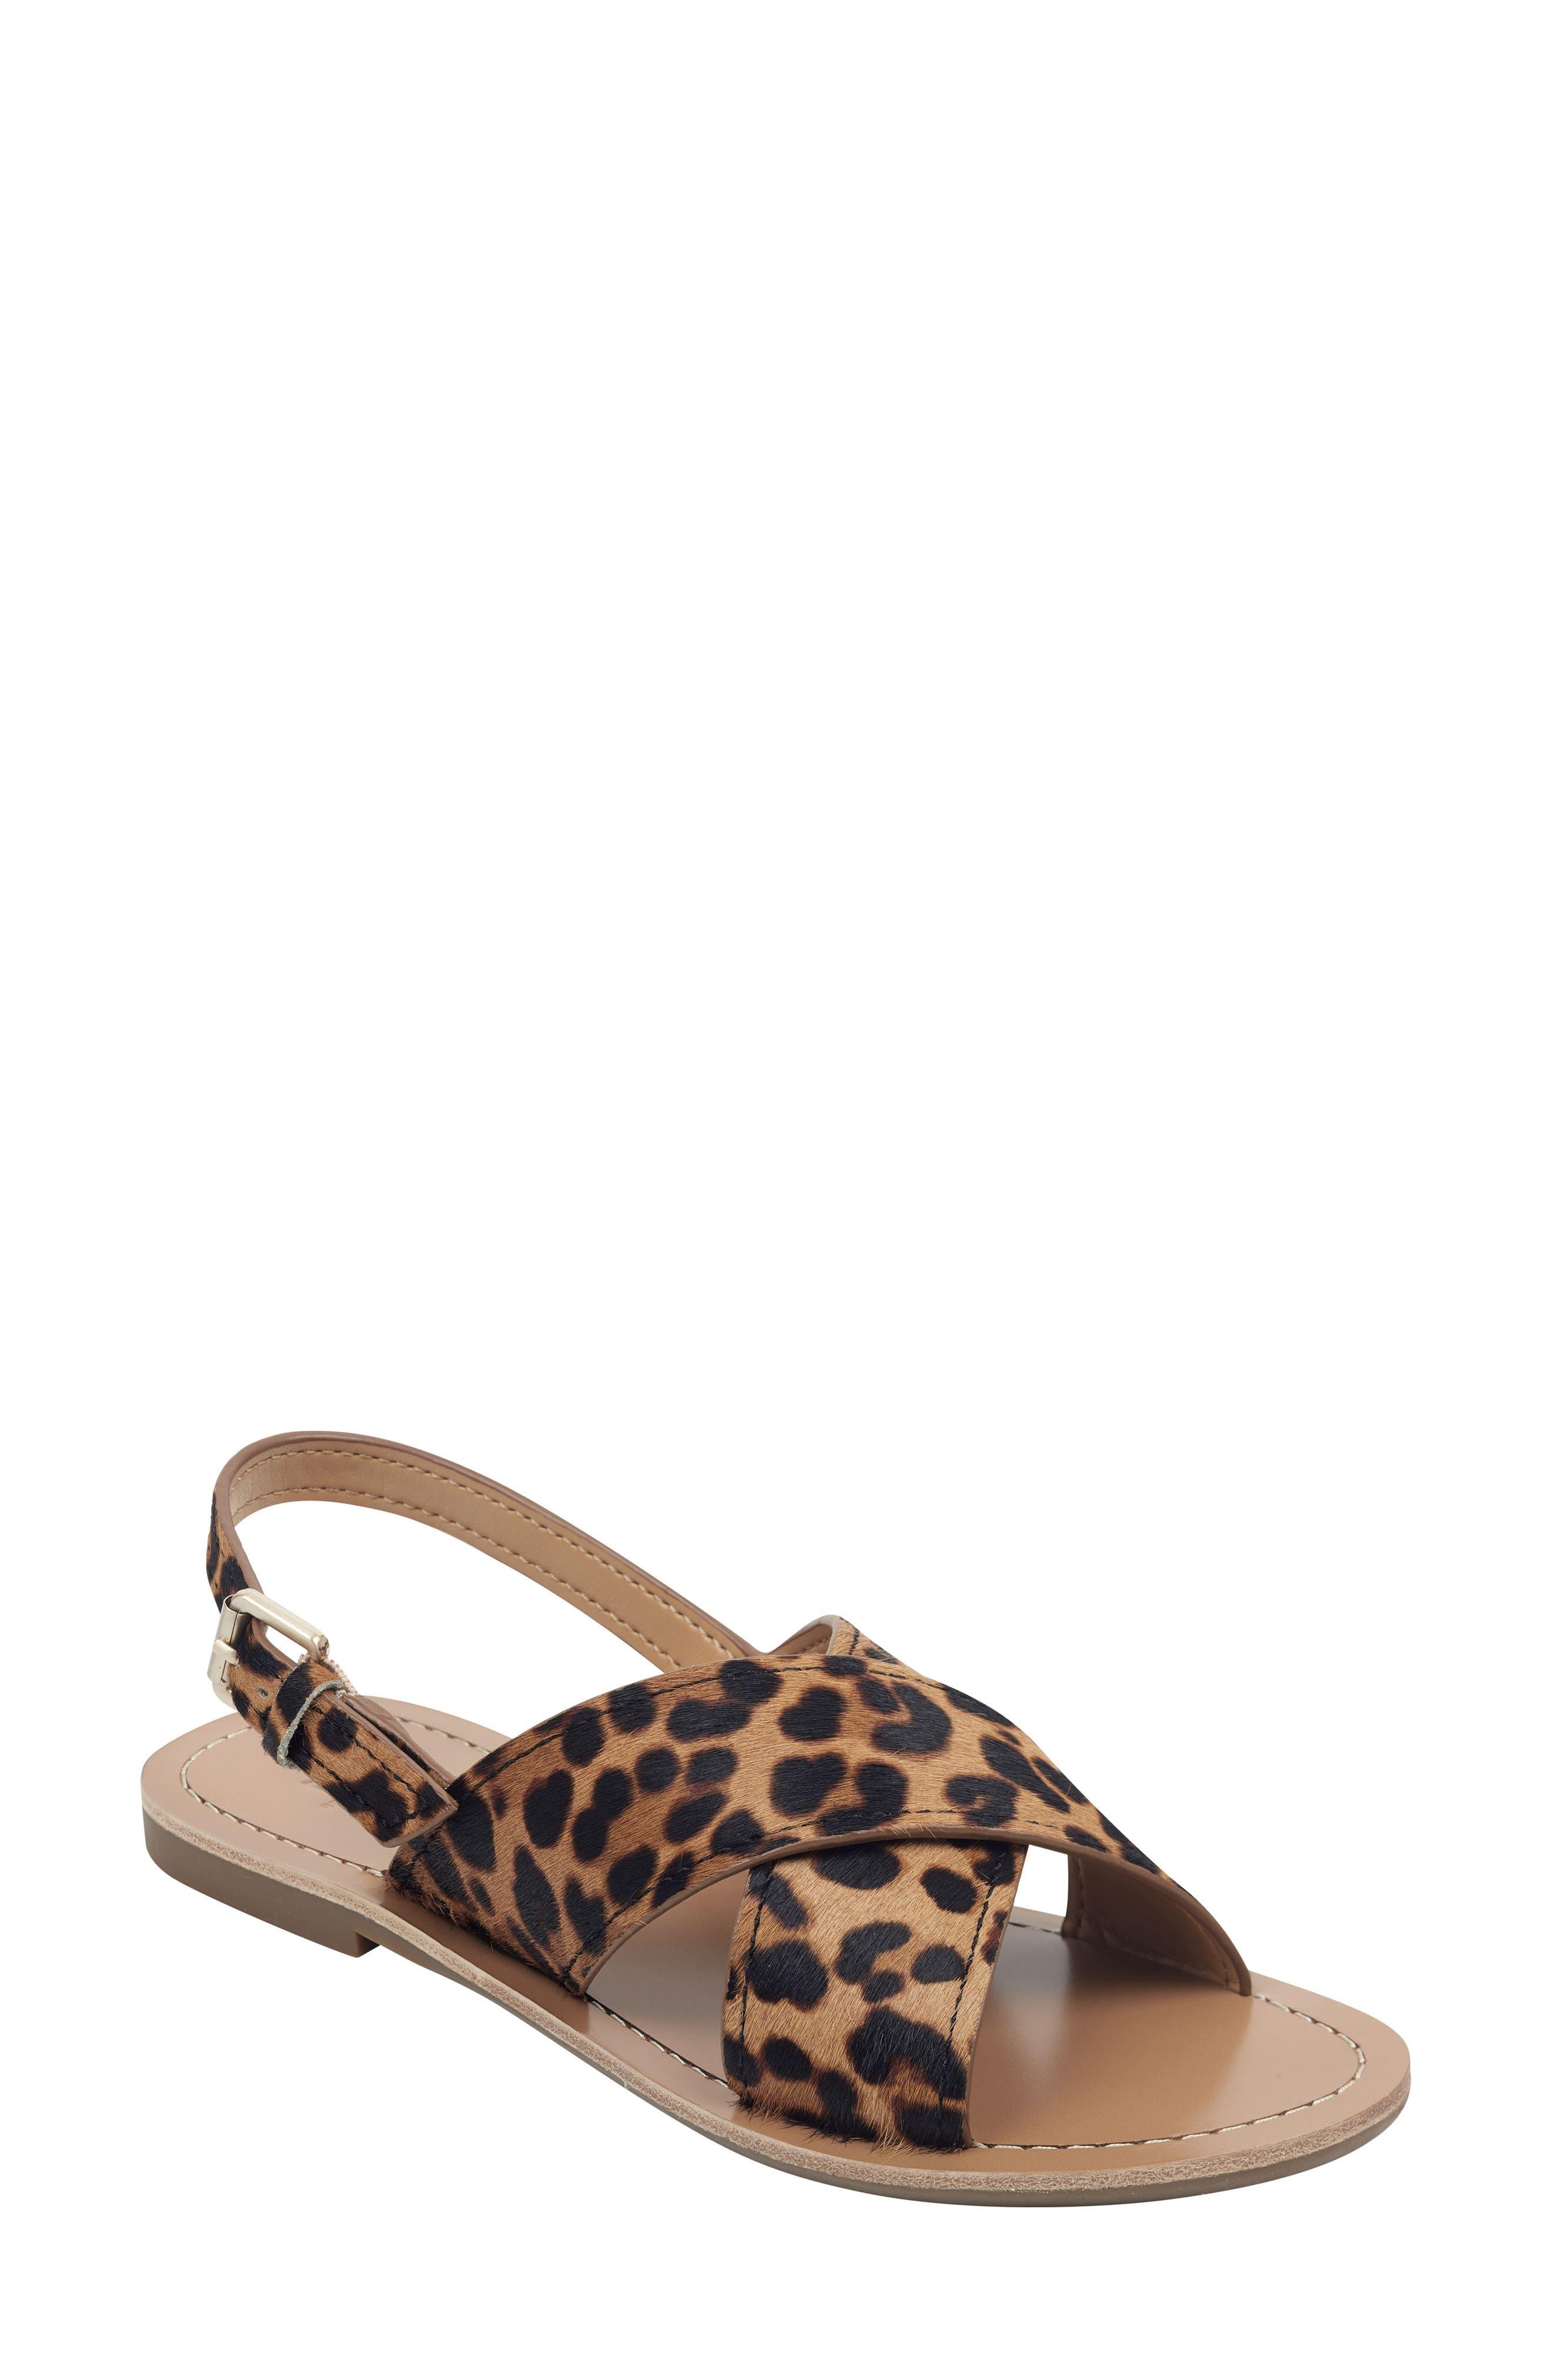 Marc Fisher Ltd Rite Sandal, Brown